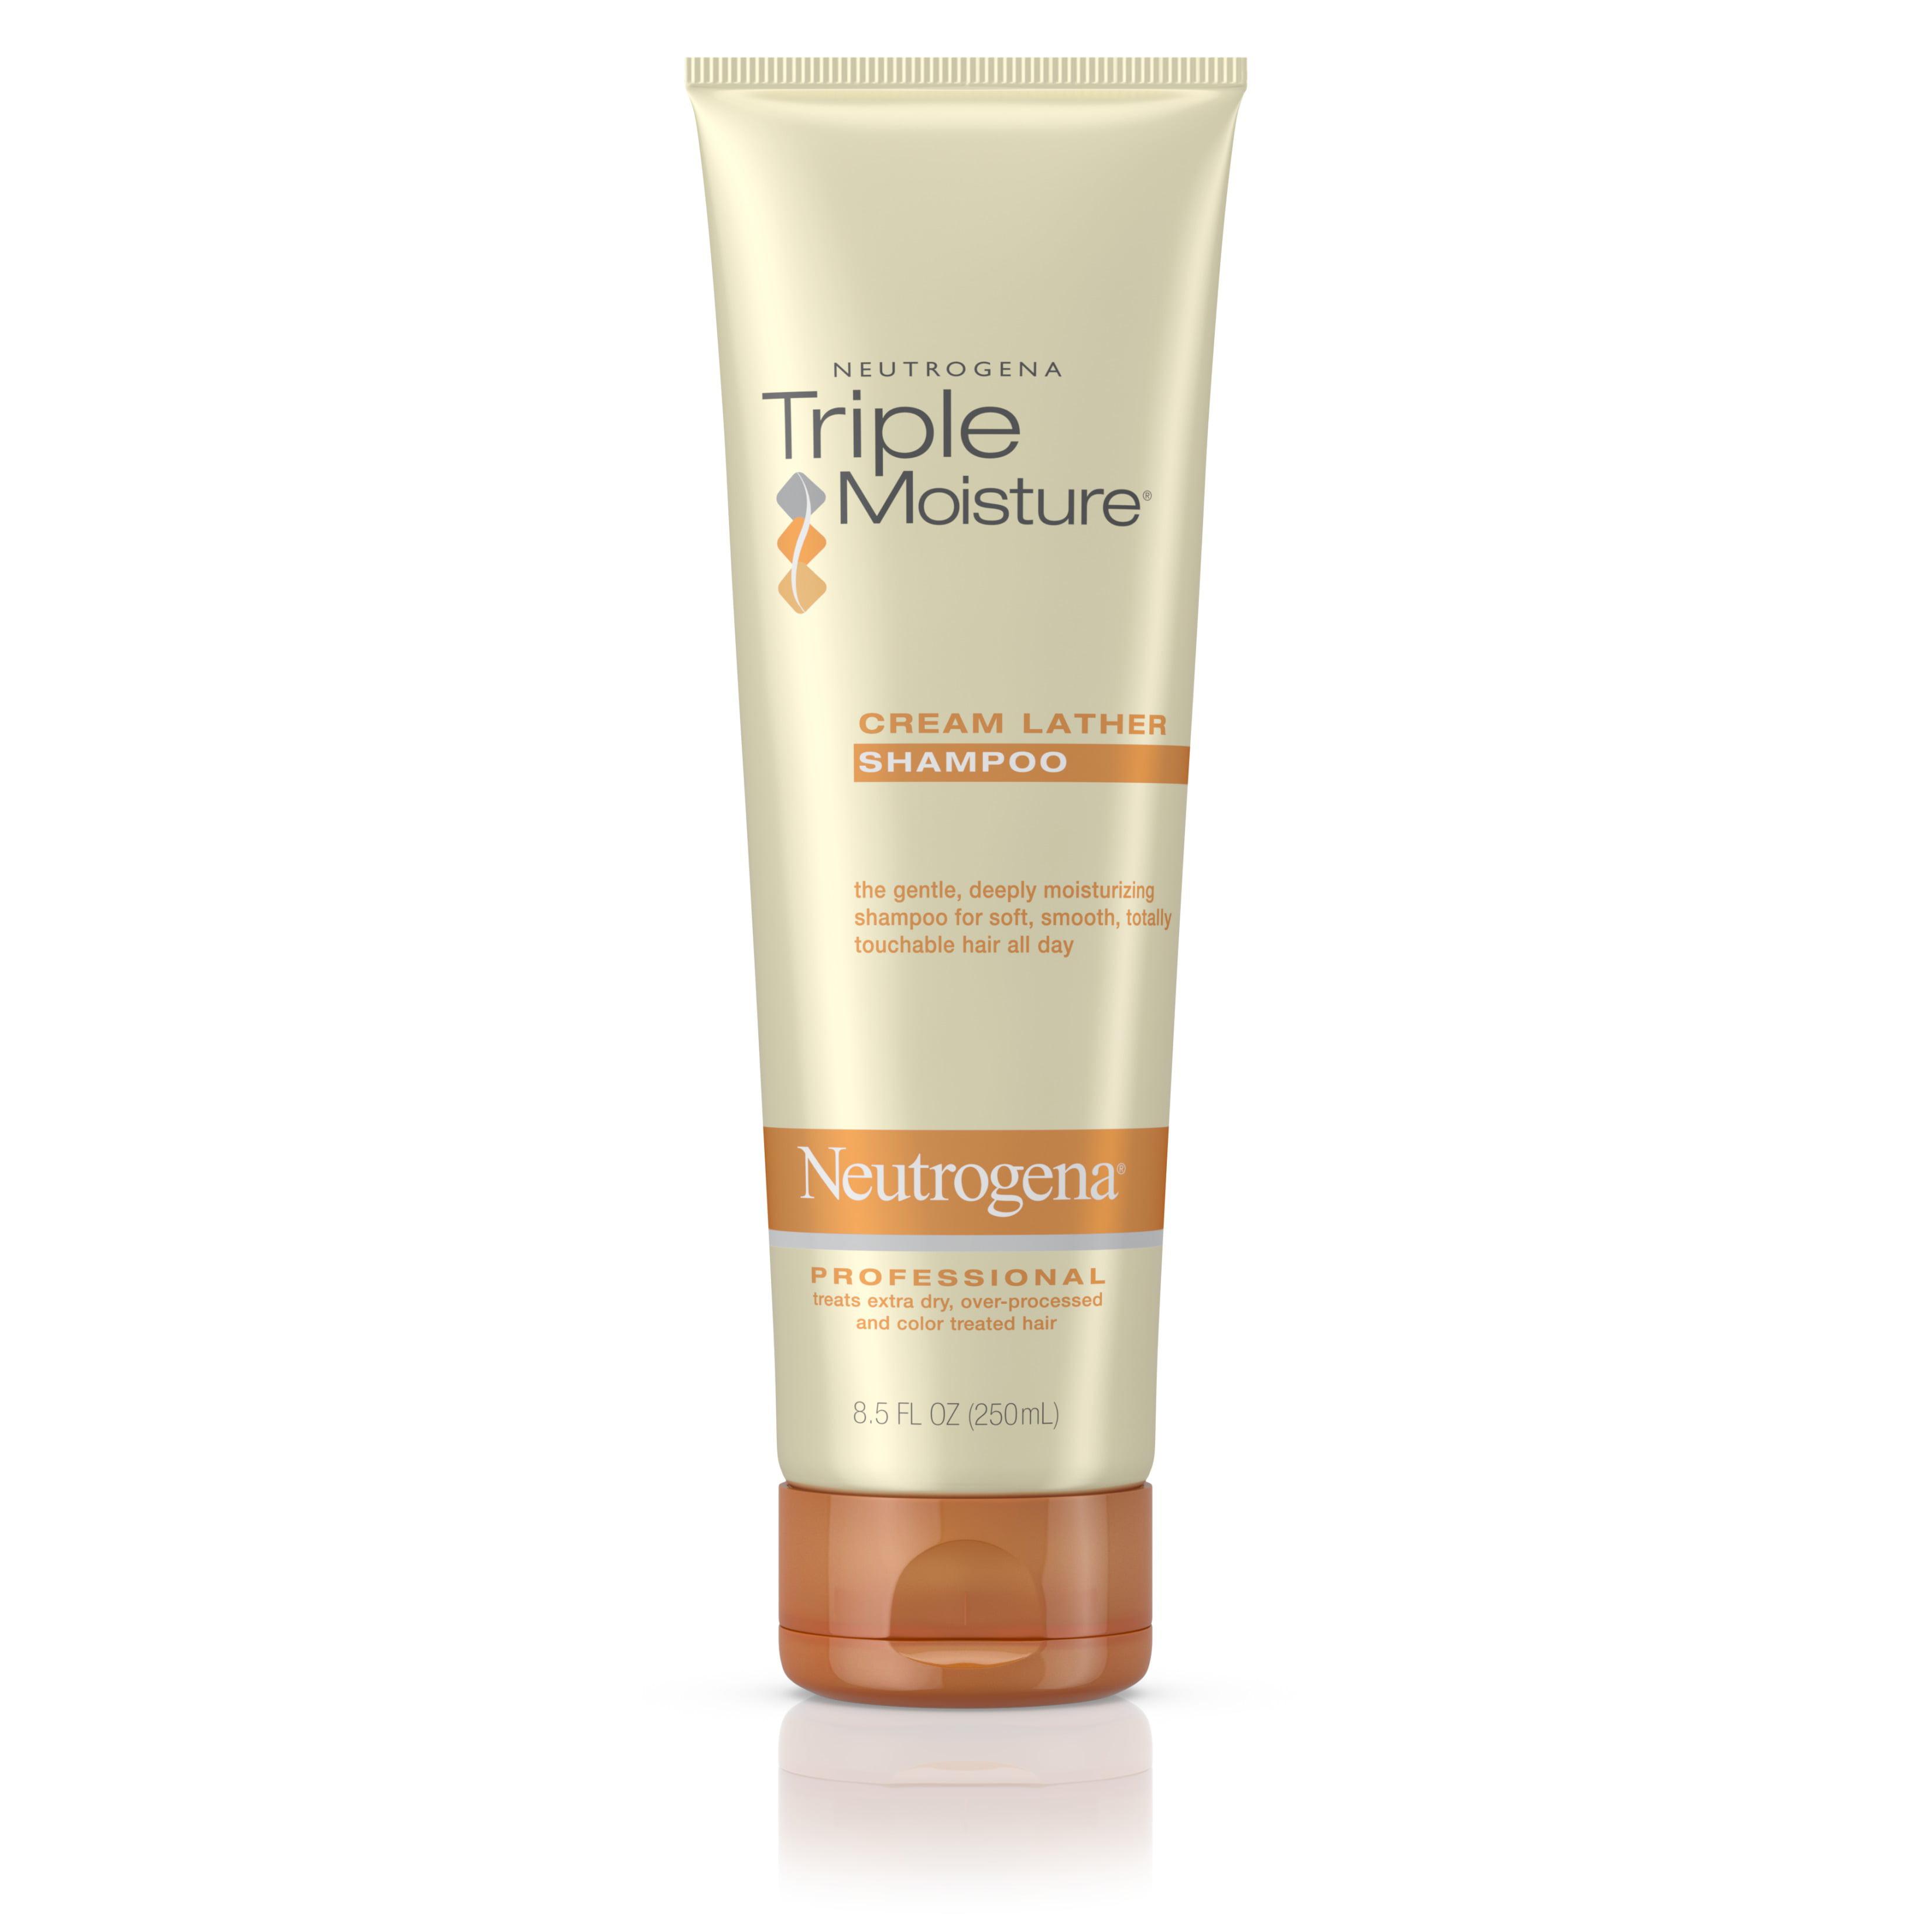 Neutrogena Triple Moisture Cream Lather Shampoo 8 5 Oz Walmart